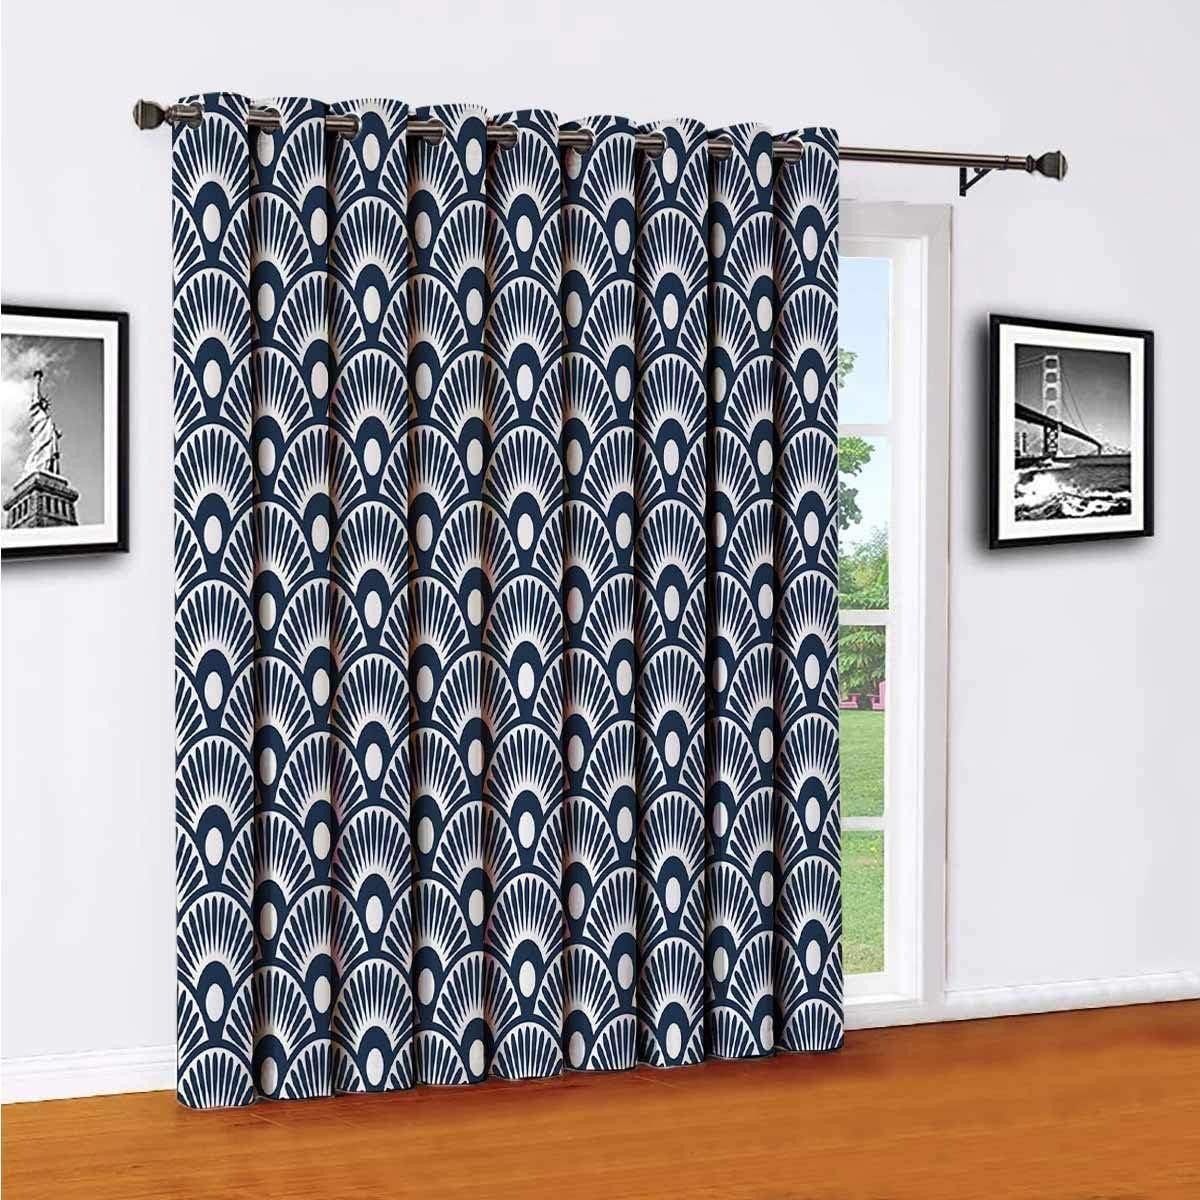 Toopeek - Cortinas opacas de poliéster con diseño de abanico, adecuadas para puertas correderas de cristal para sala de estar, cortinas térmicas de 96 x 96 pulgadas